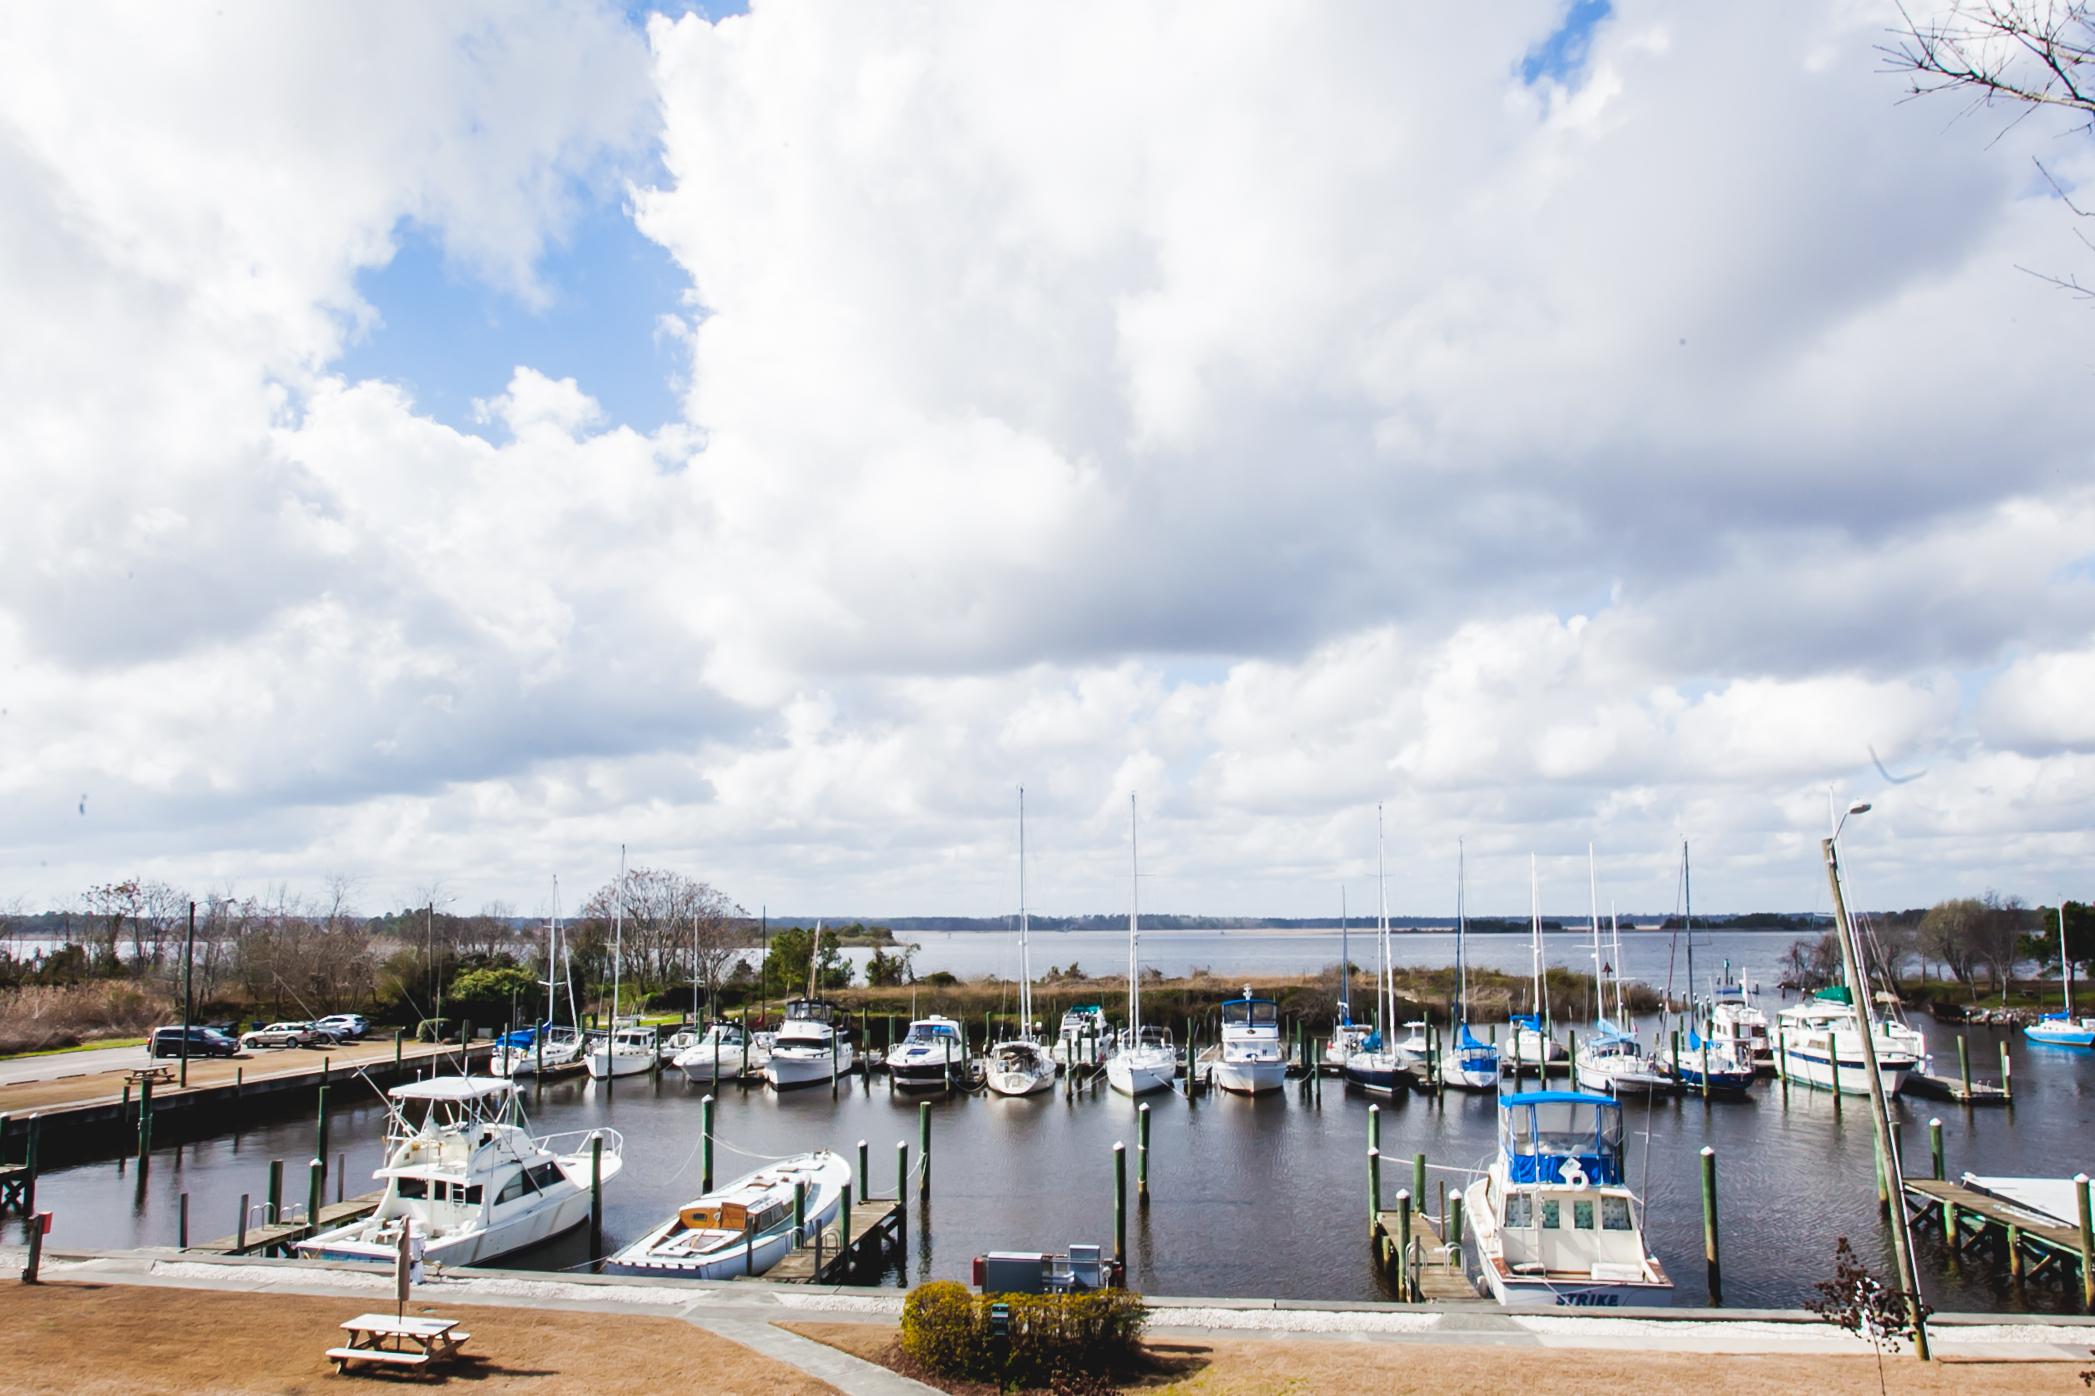 WIlmington Marine Boat Slips